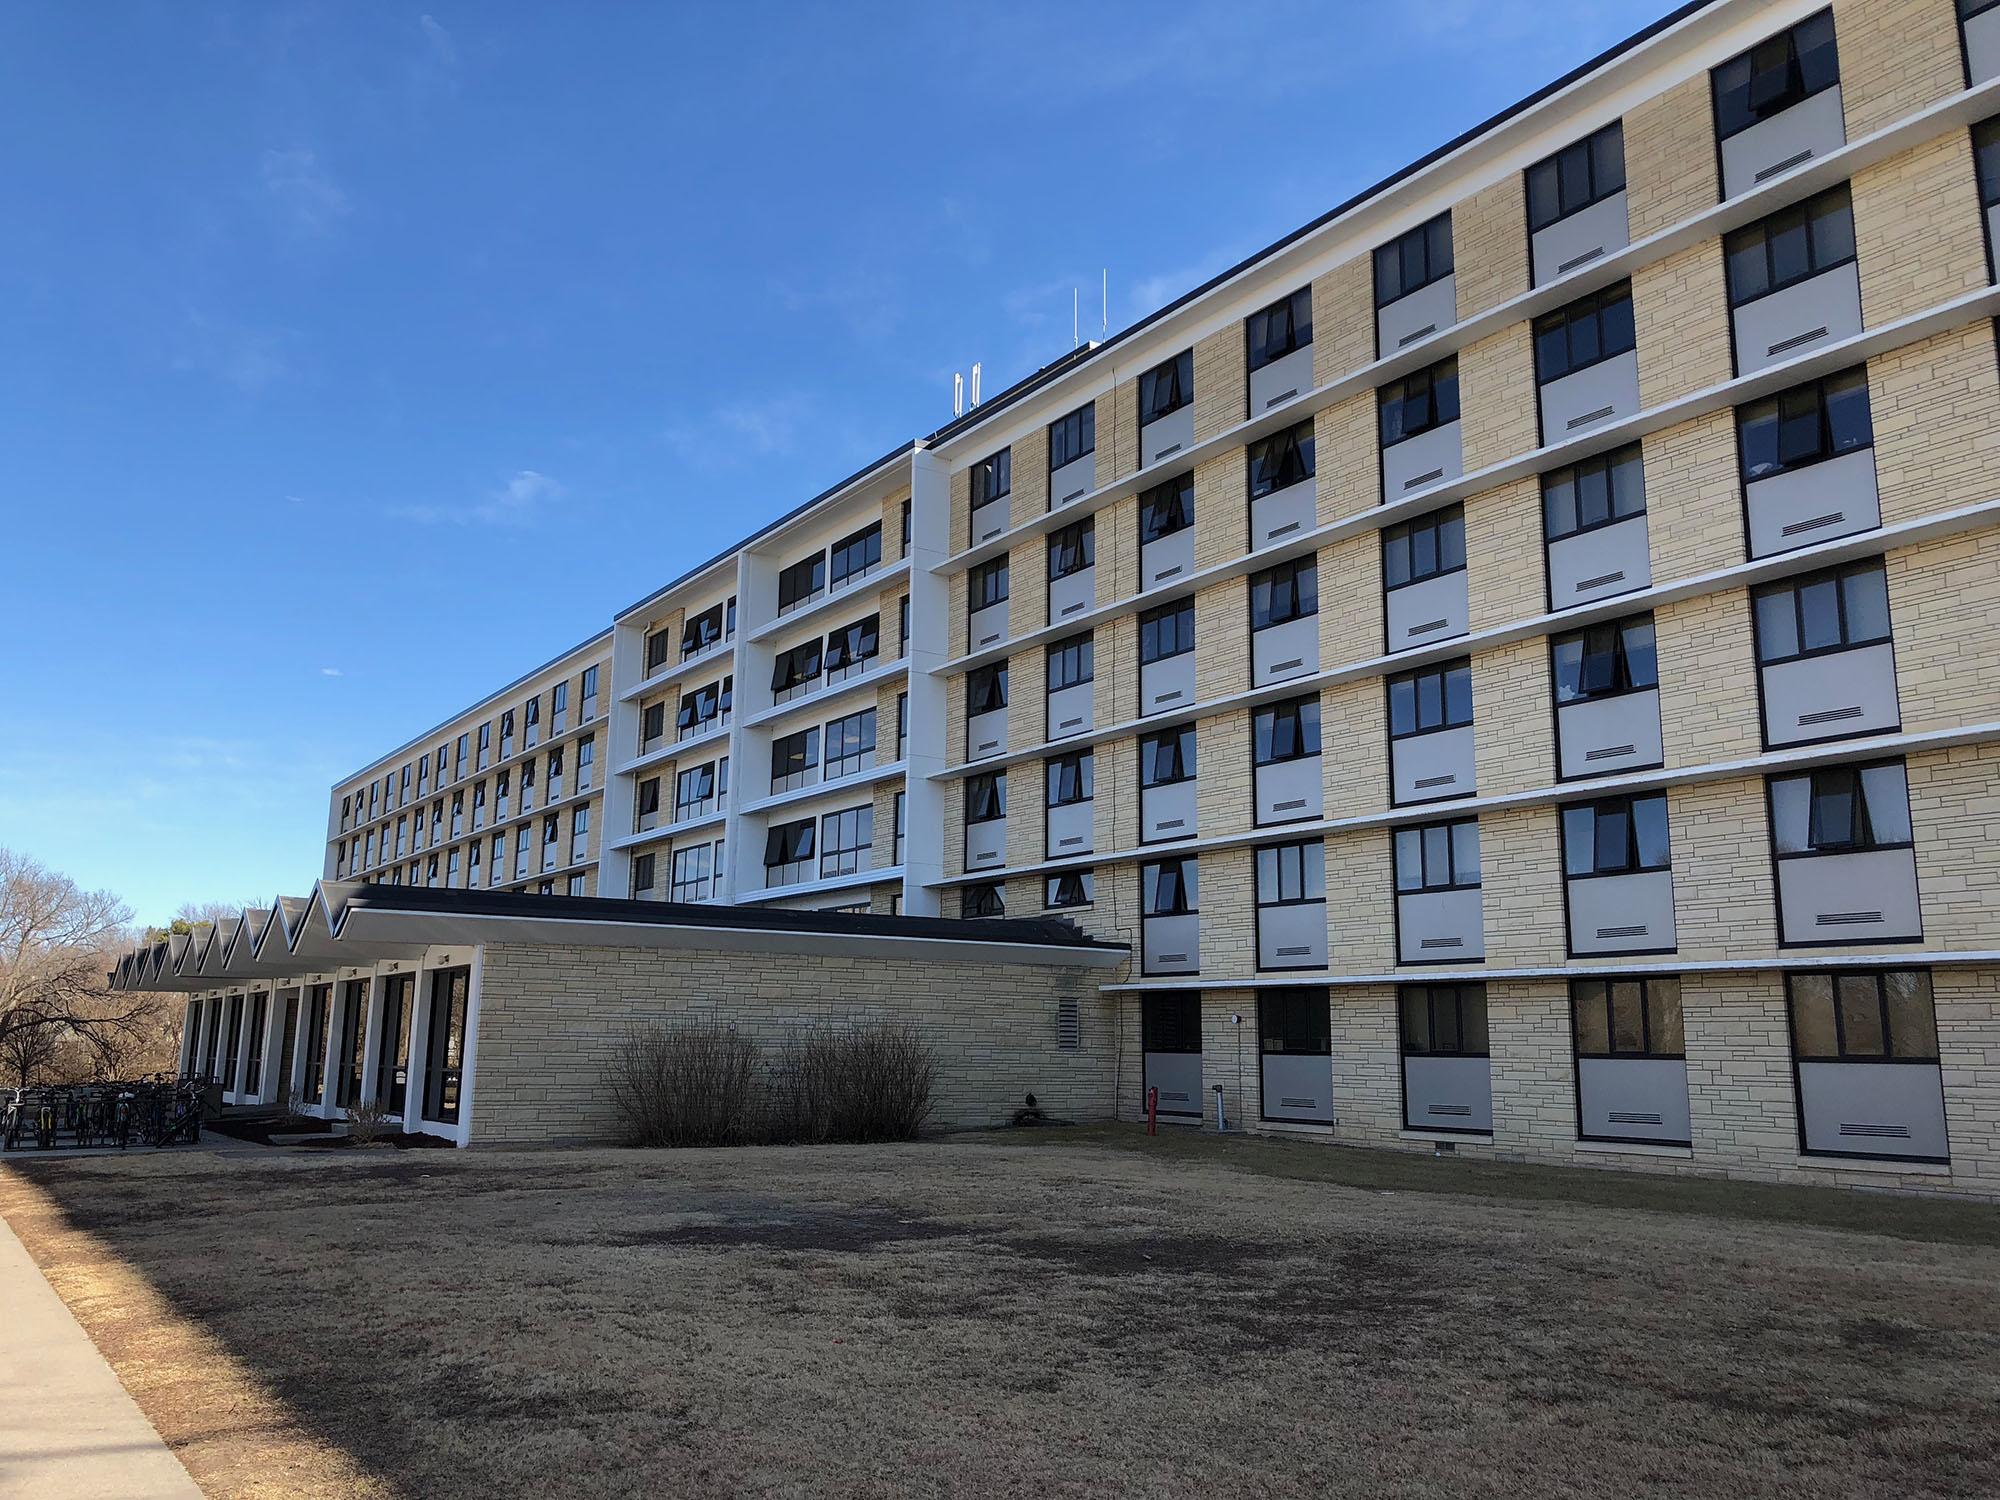 Fhsu Mcmindes Hall Fort Hays State University